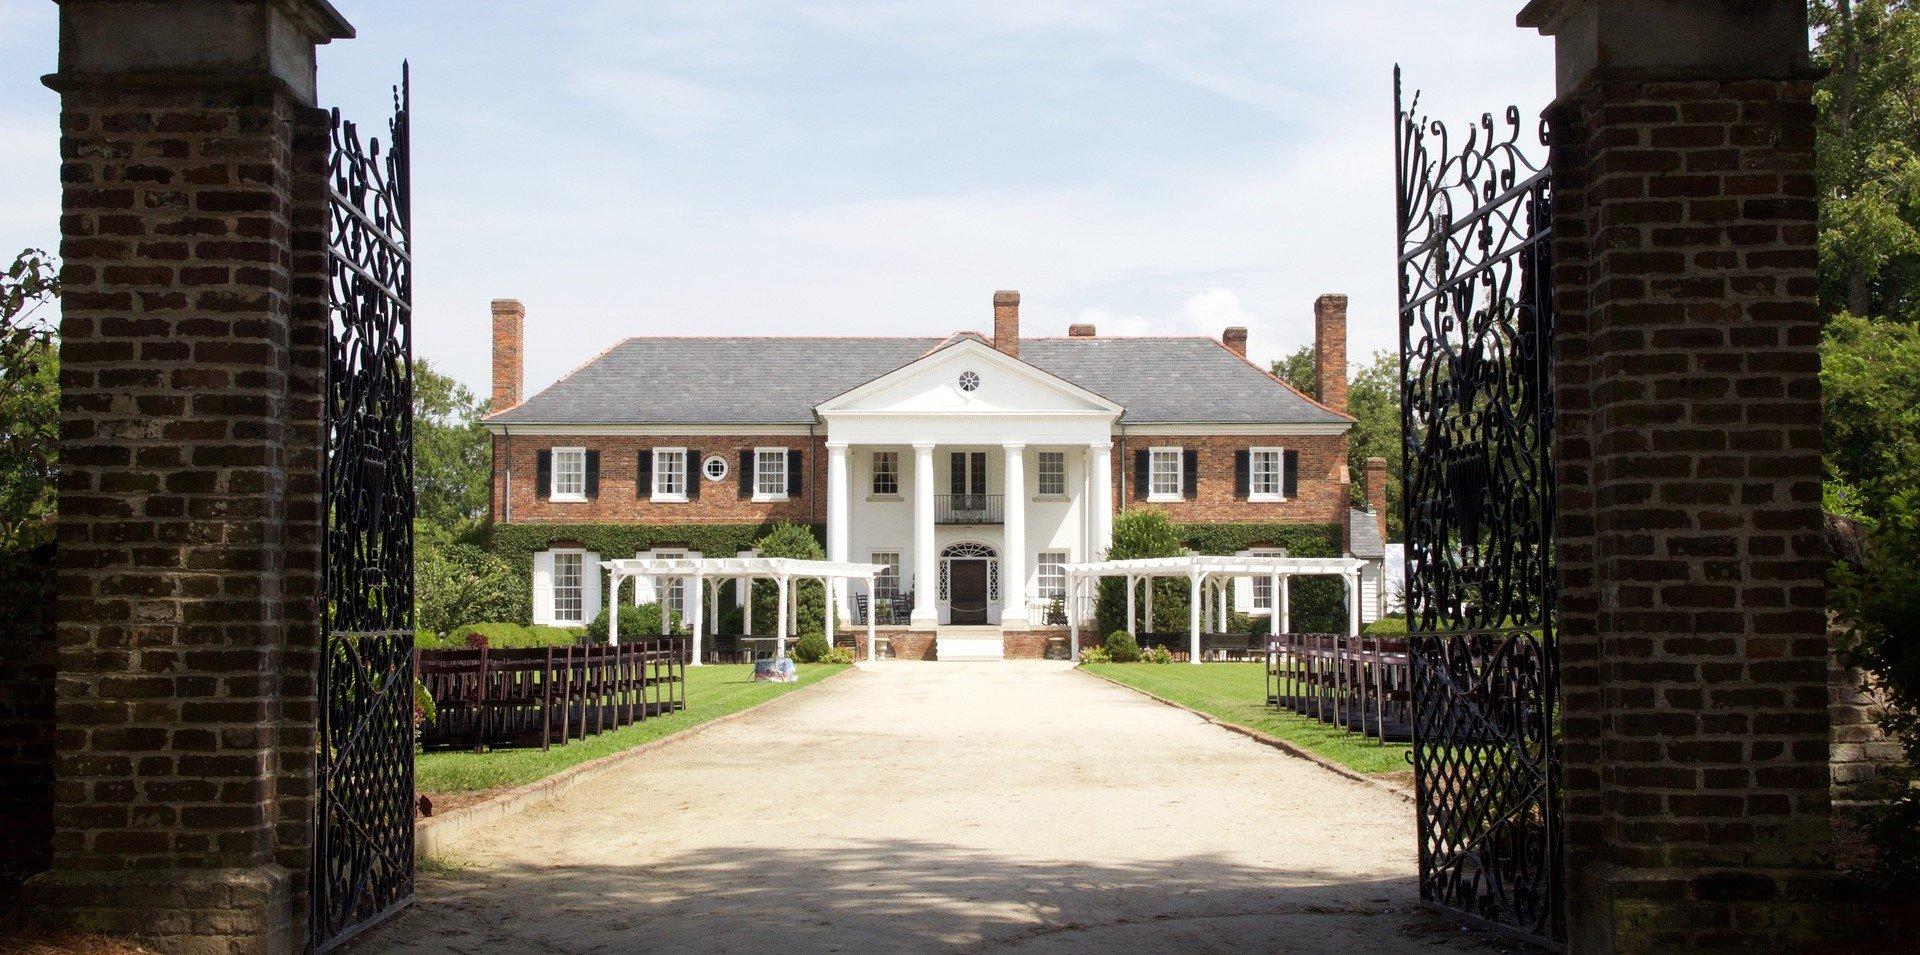 Old House in South Carolina - VeteranCarDonations.org